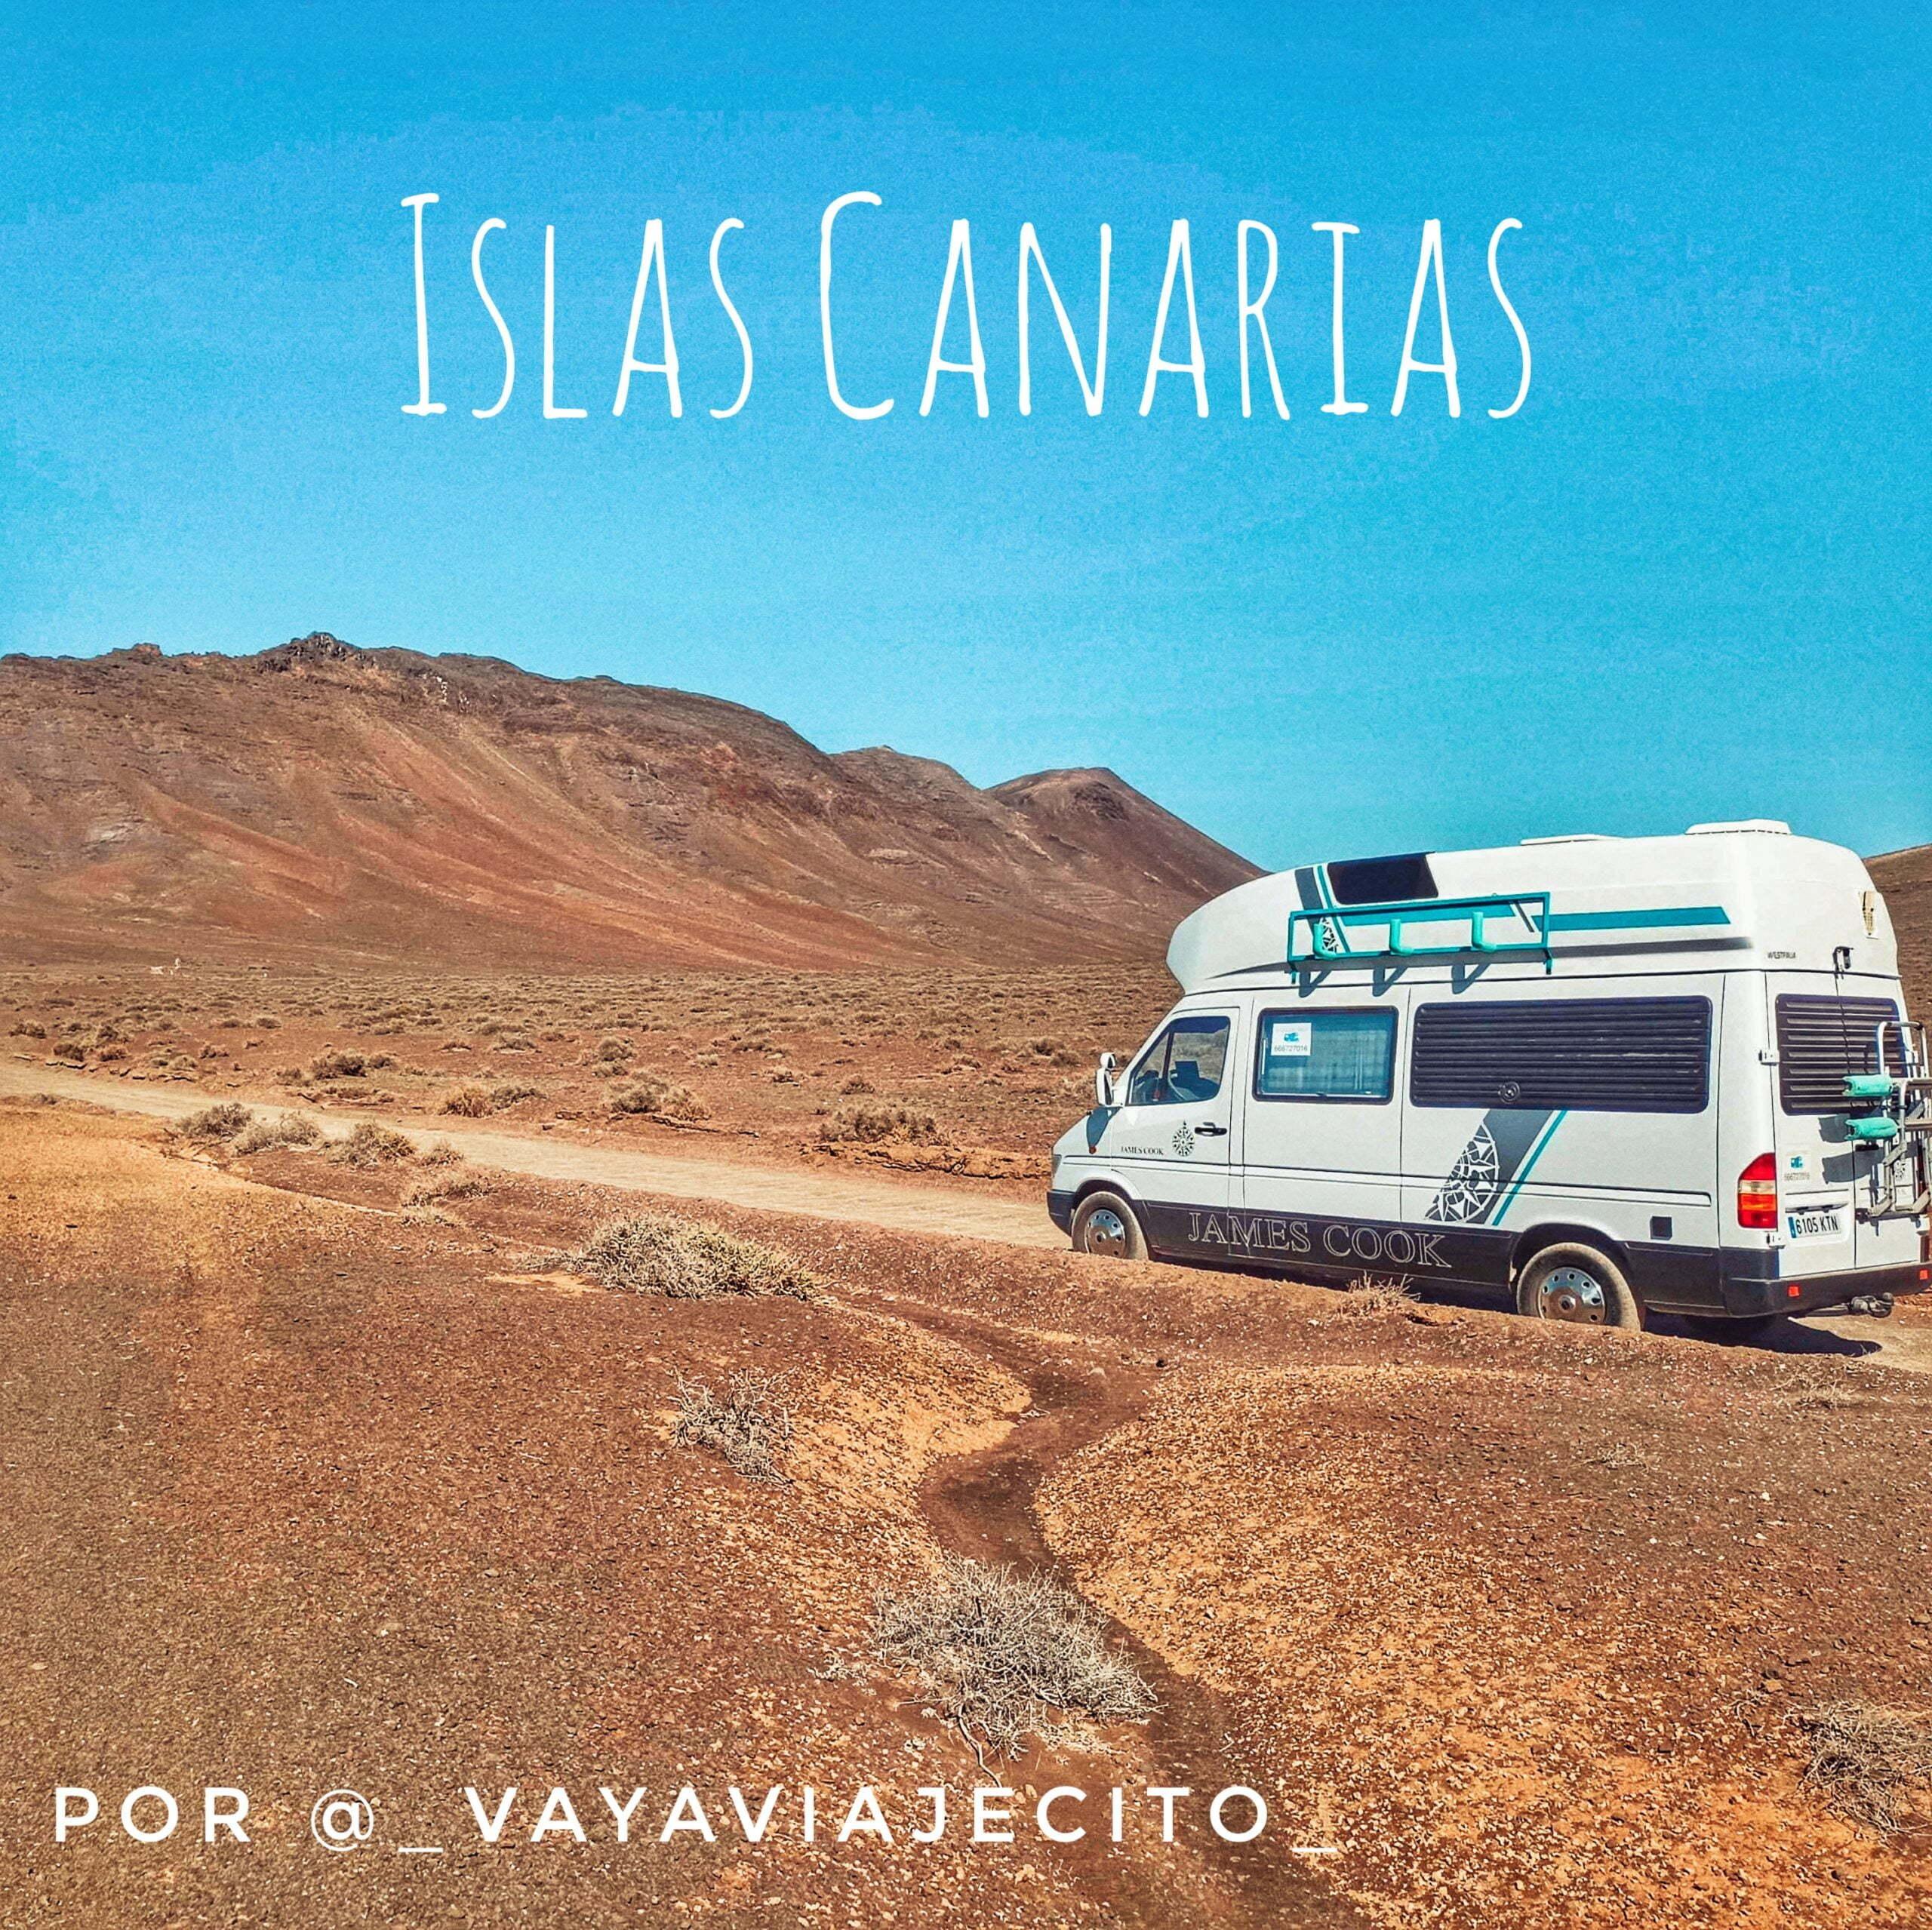 Les îles Canaries en camping-car ou camping-car à travers 4 de ses îles par @_vayaviajecito_